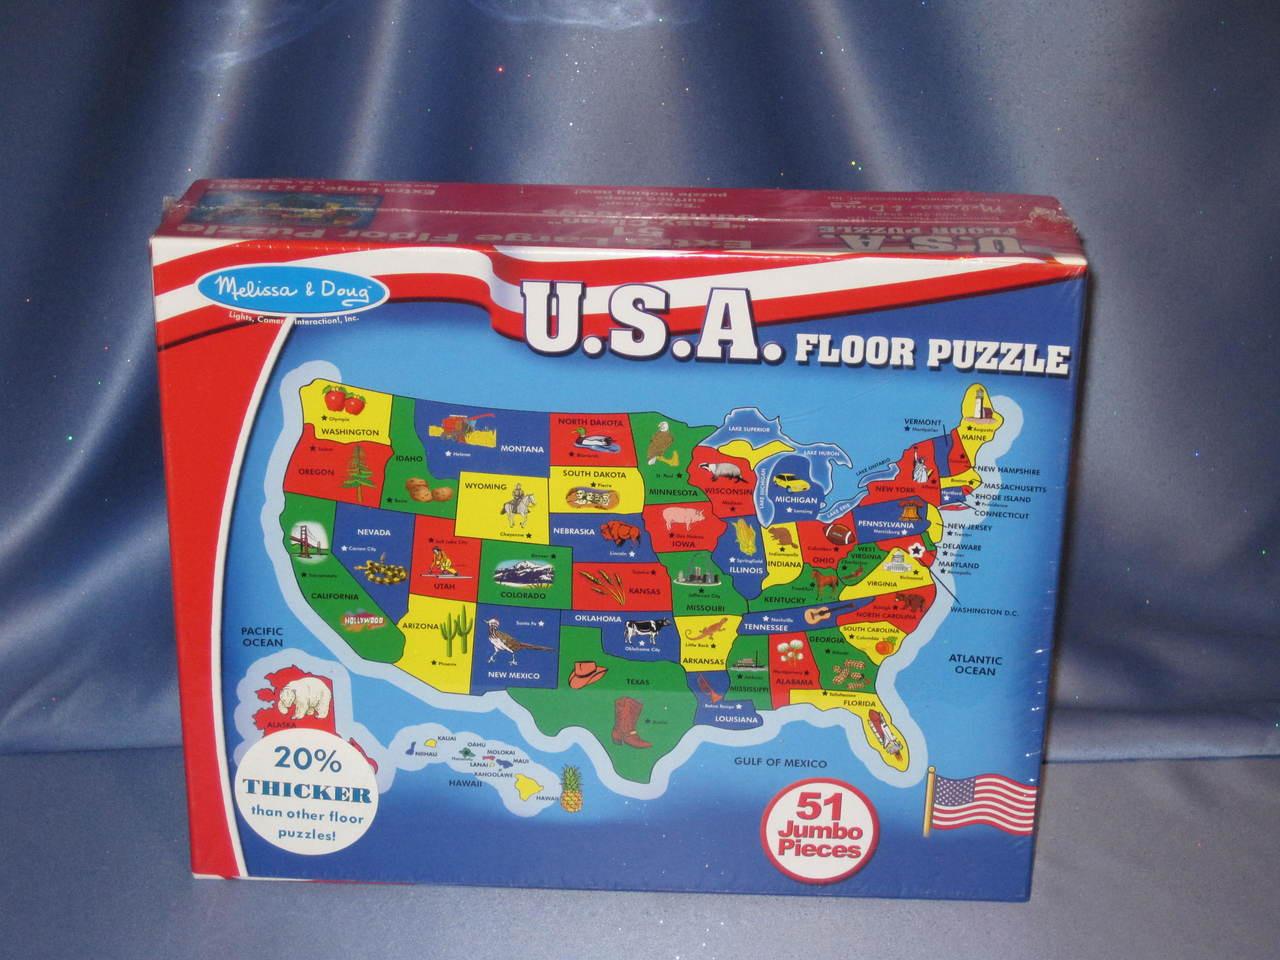 U.S.A. Floor Puzzle by Melissa & Doug.